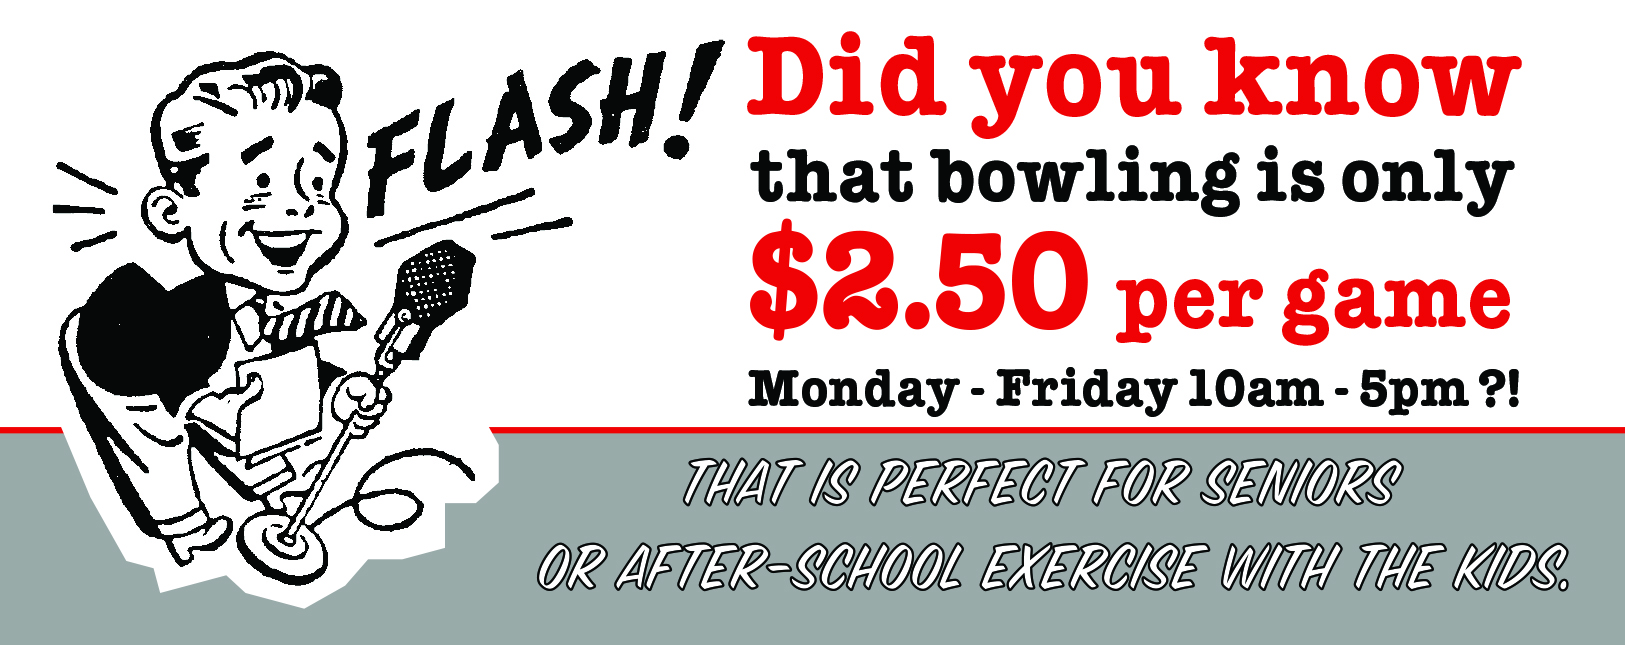 $2.50 Bowling